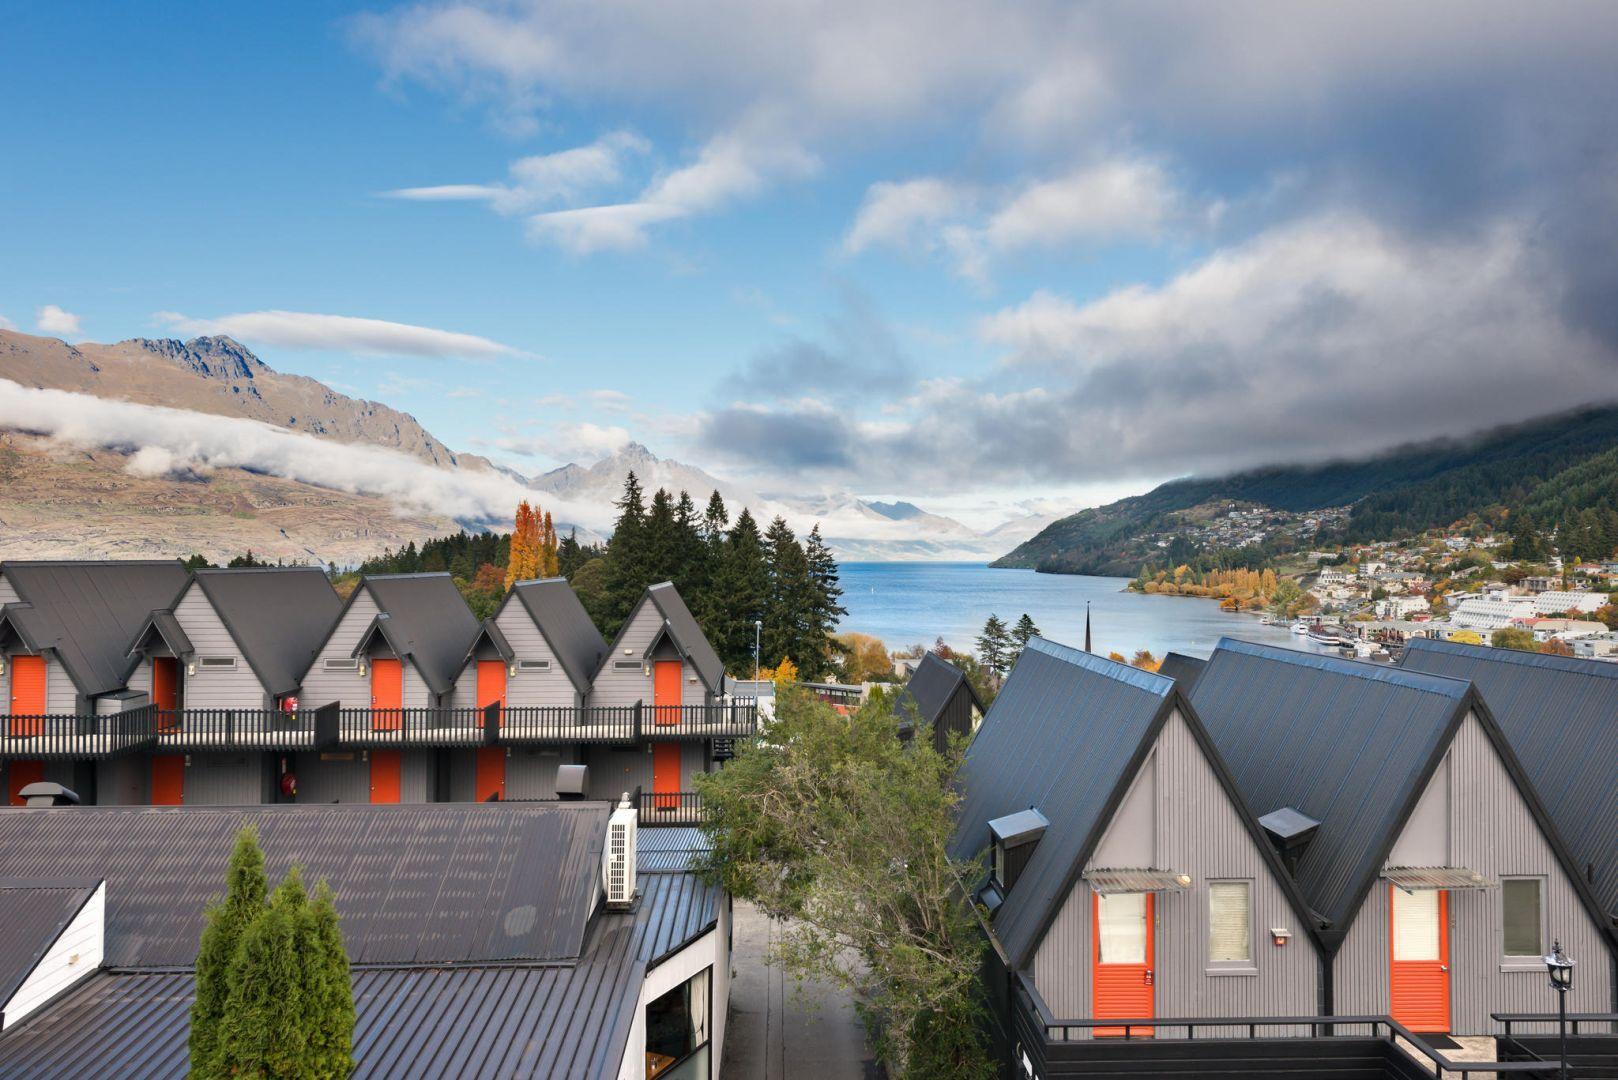 Heartland Queenstown | Inspired New Zealand Tours